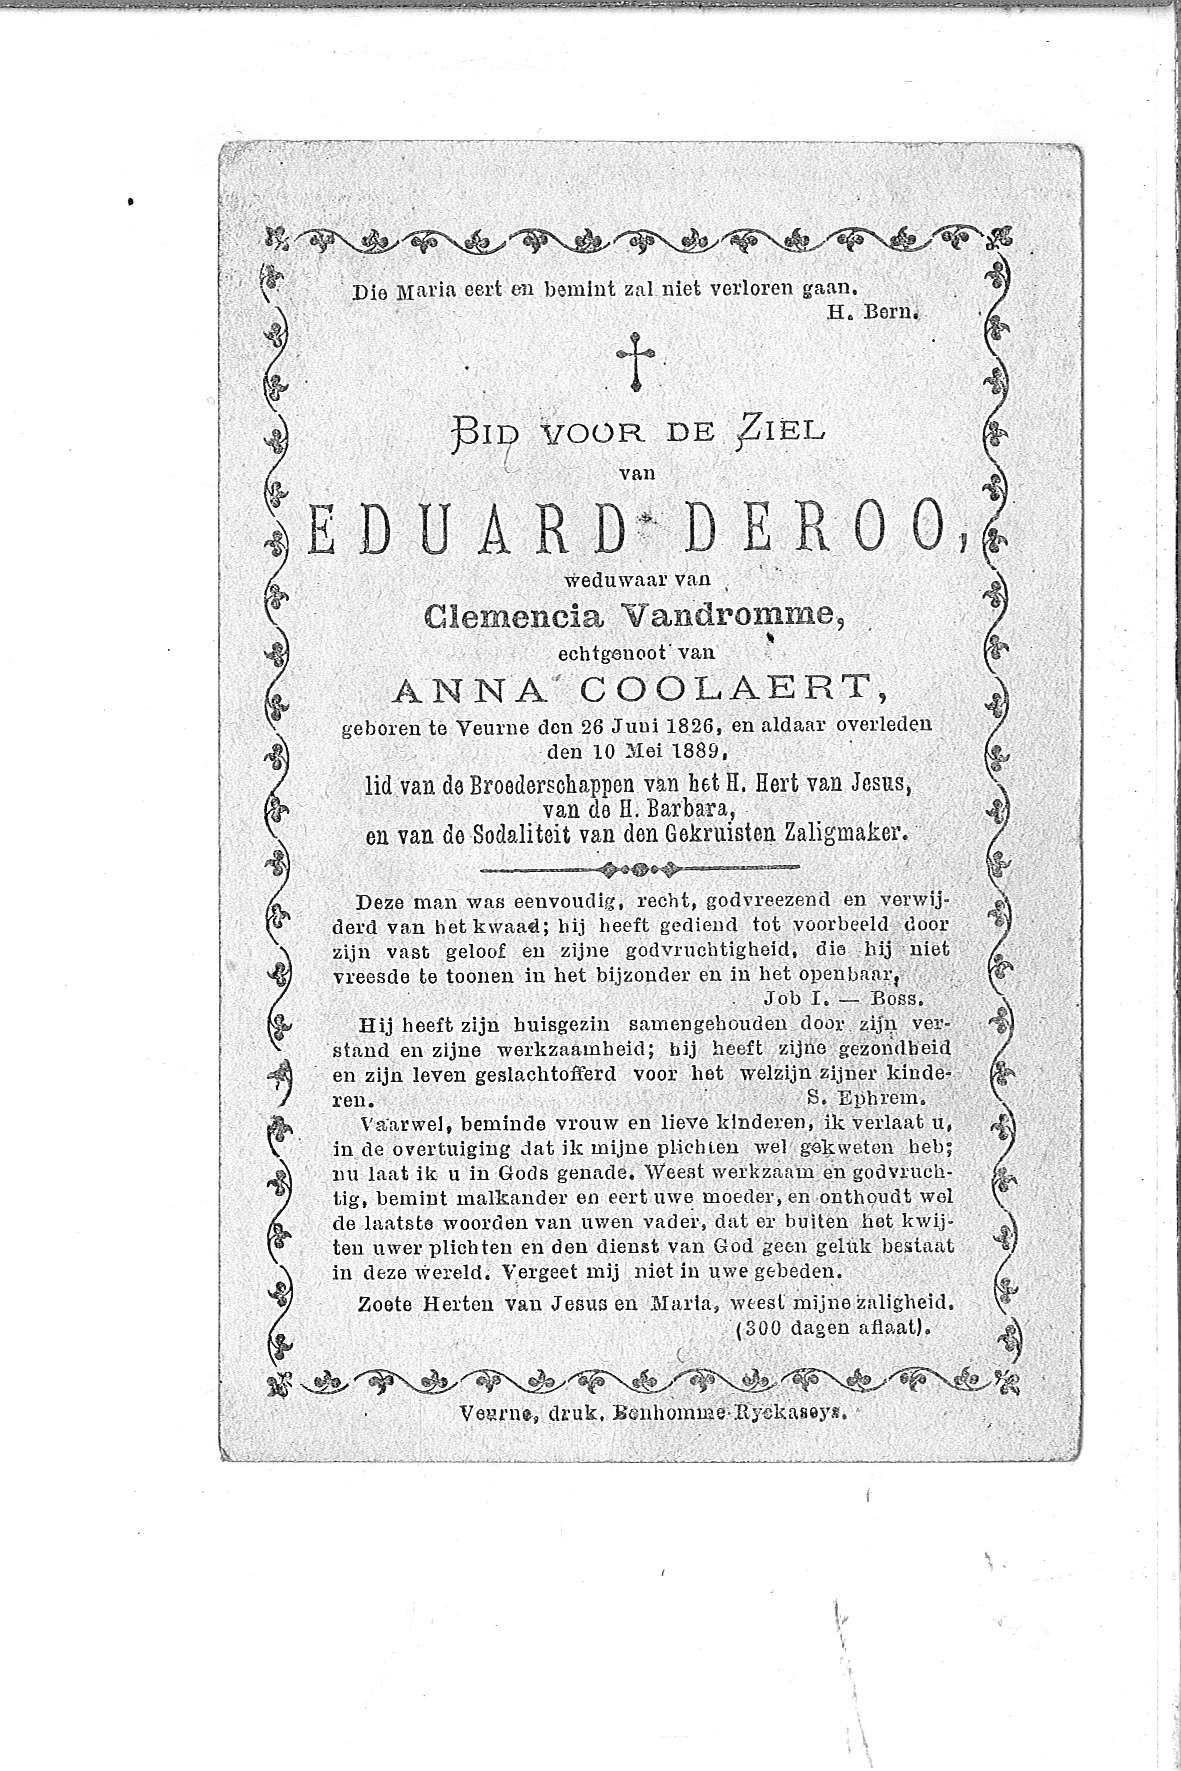 Eduard(1889)20131217152551_00014.jpg